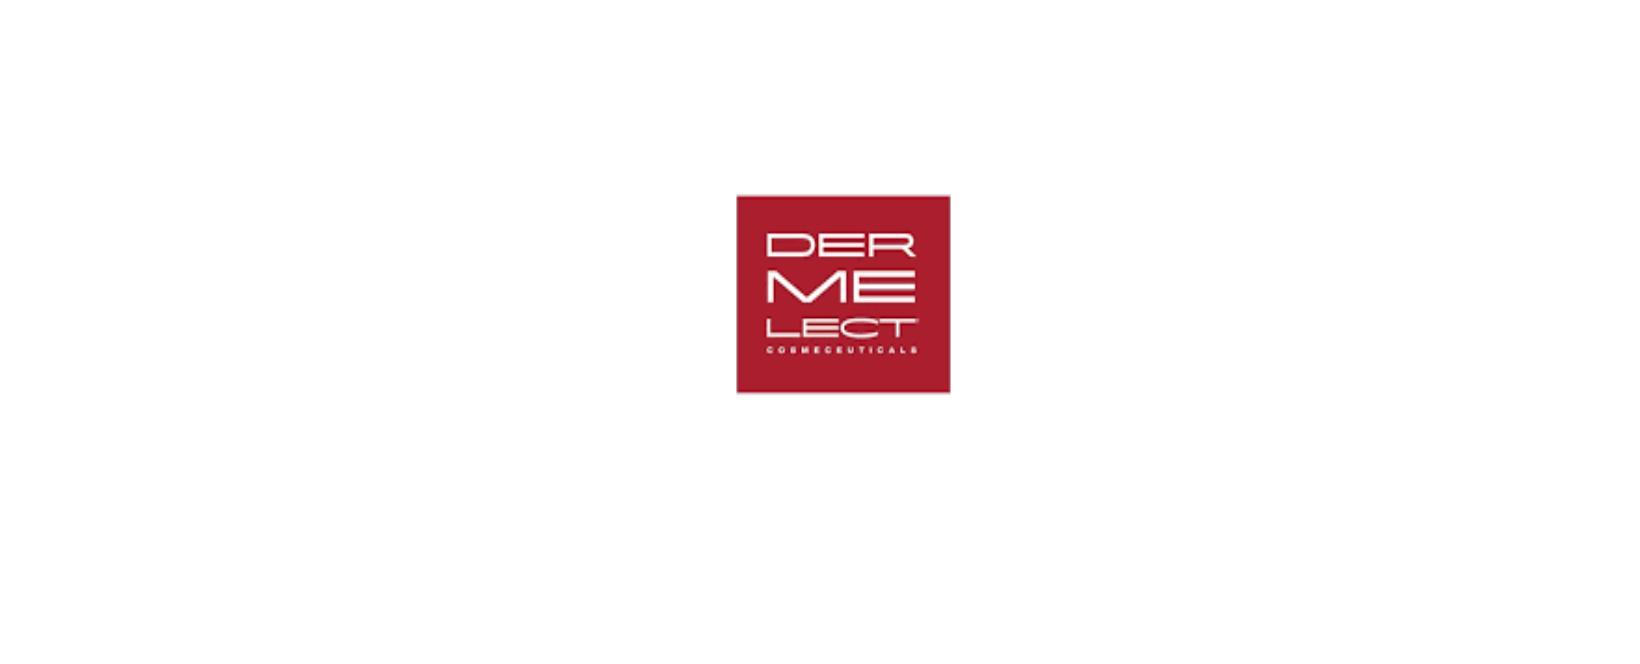 Dermelect Discount Code 2021